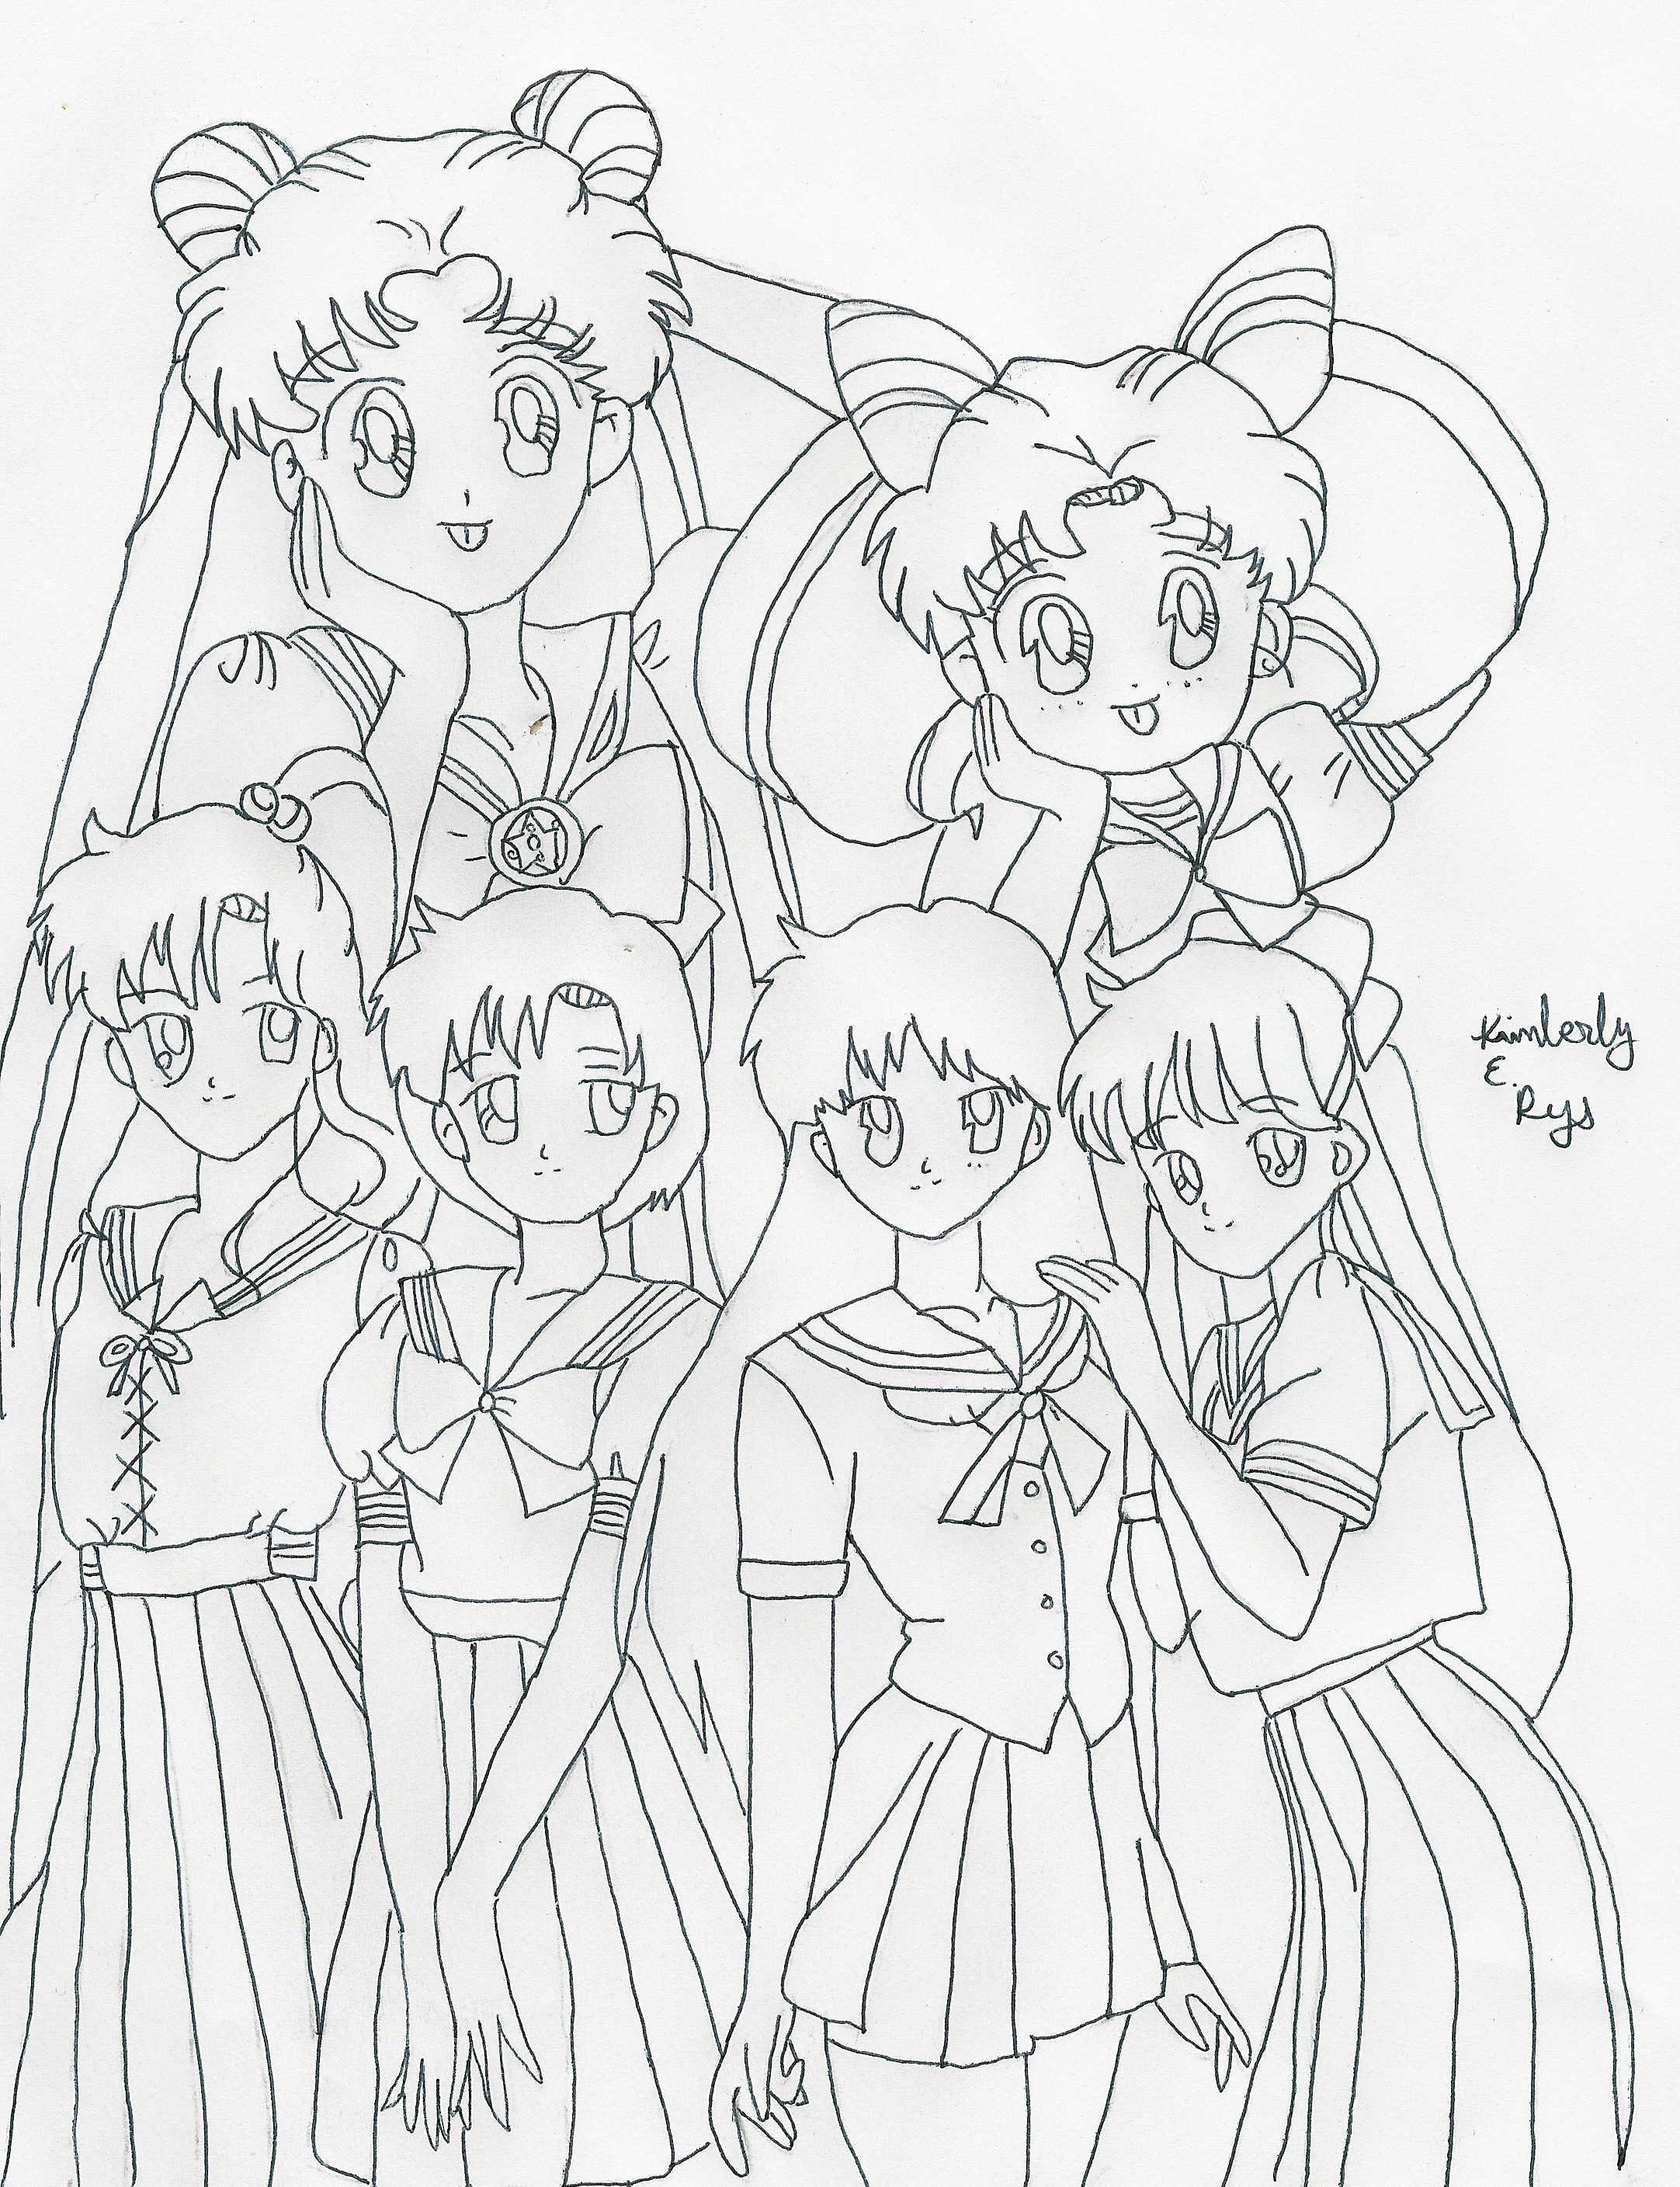 Sailor moon line art by karadarkthorn on deviantart for Sailor moon group coloring pages